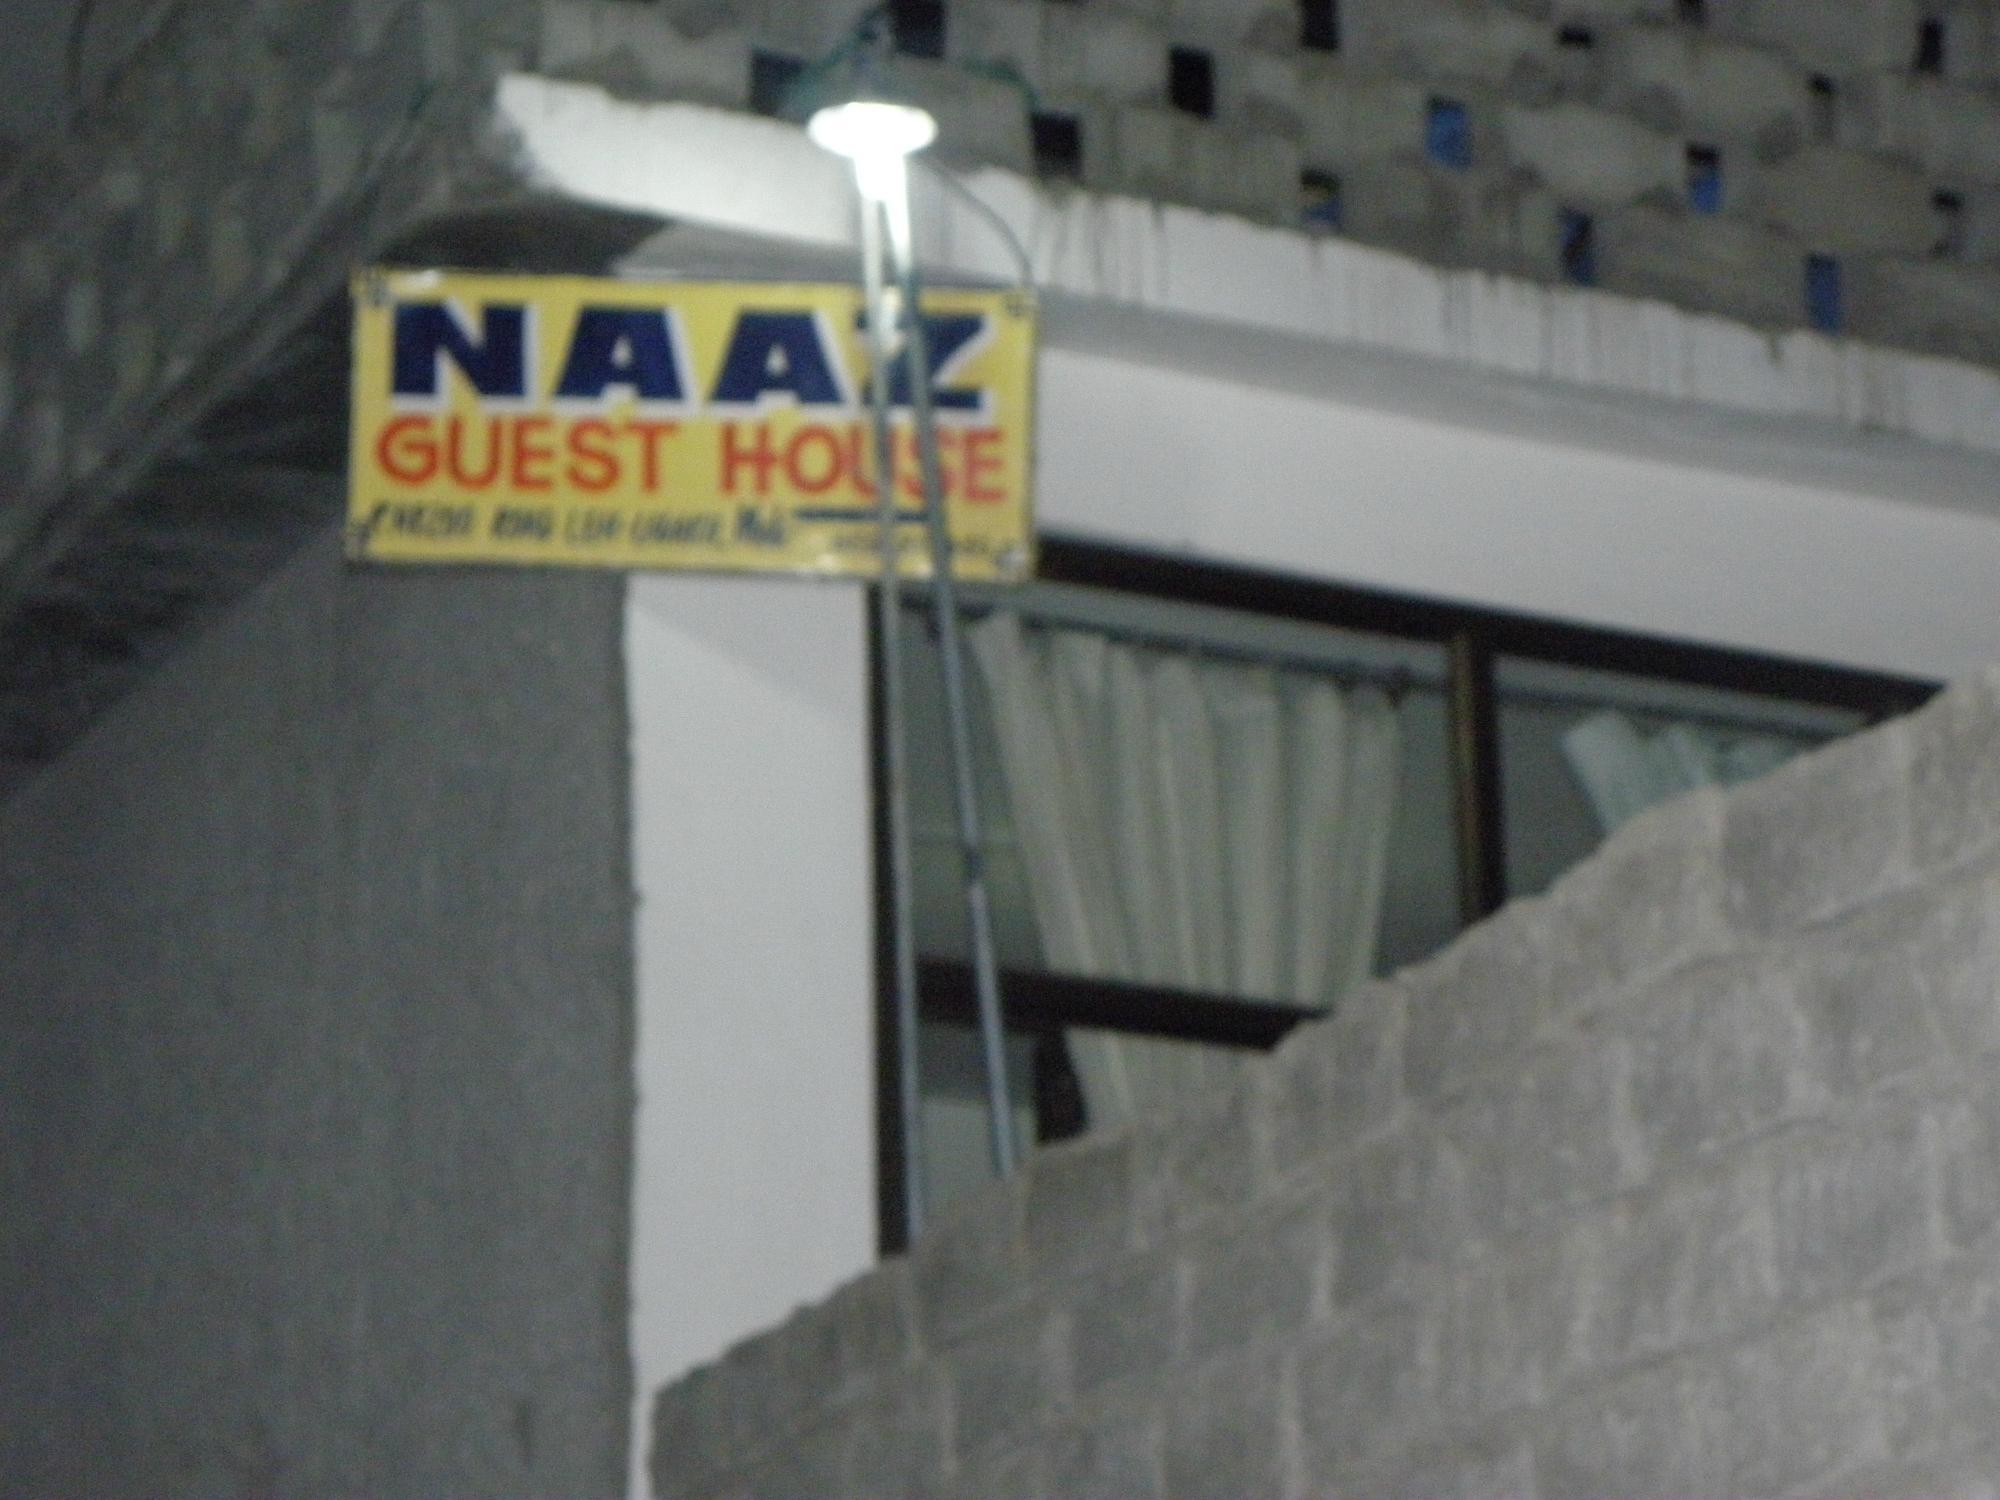 Naaz Guesthouse